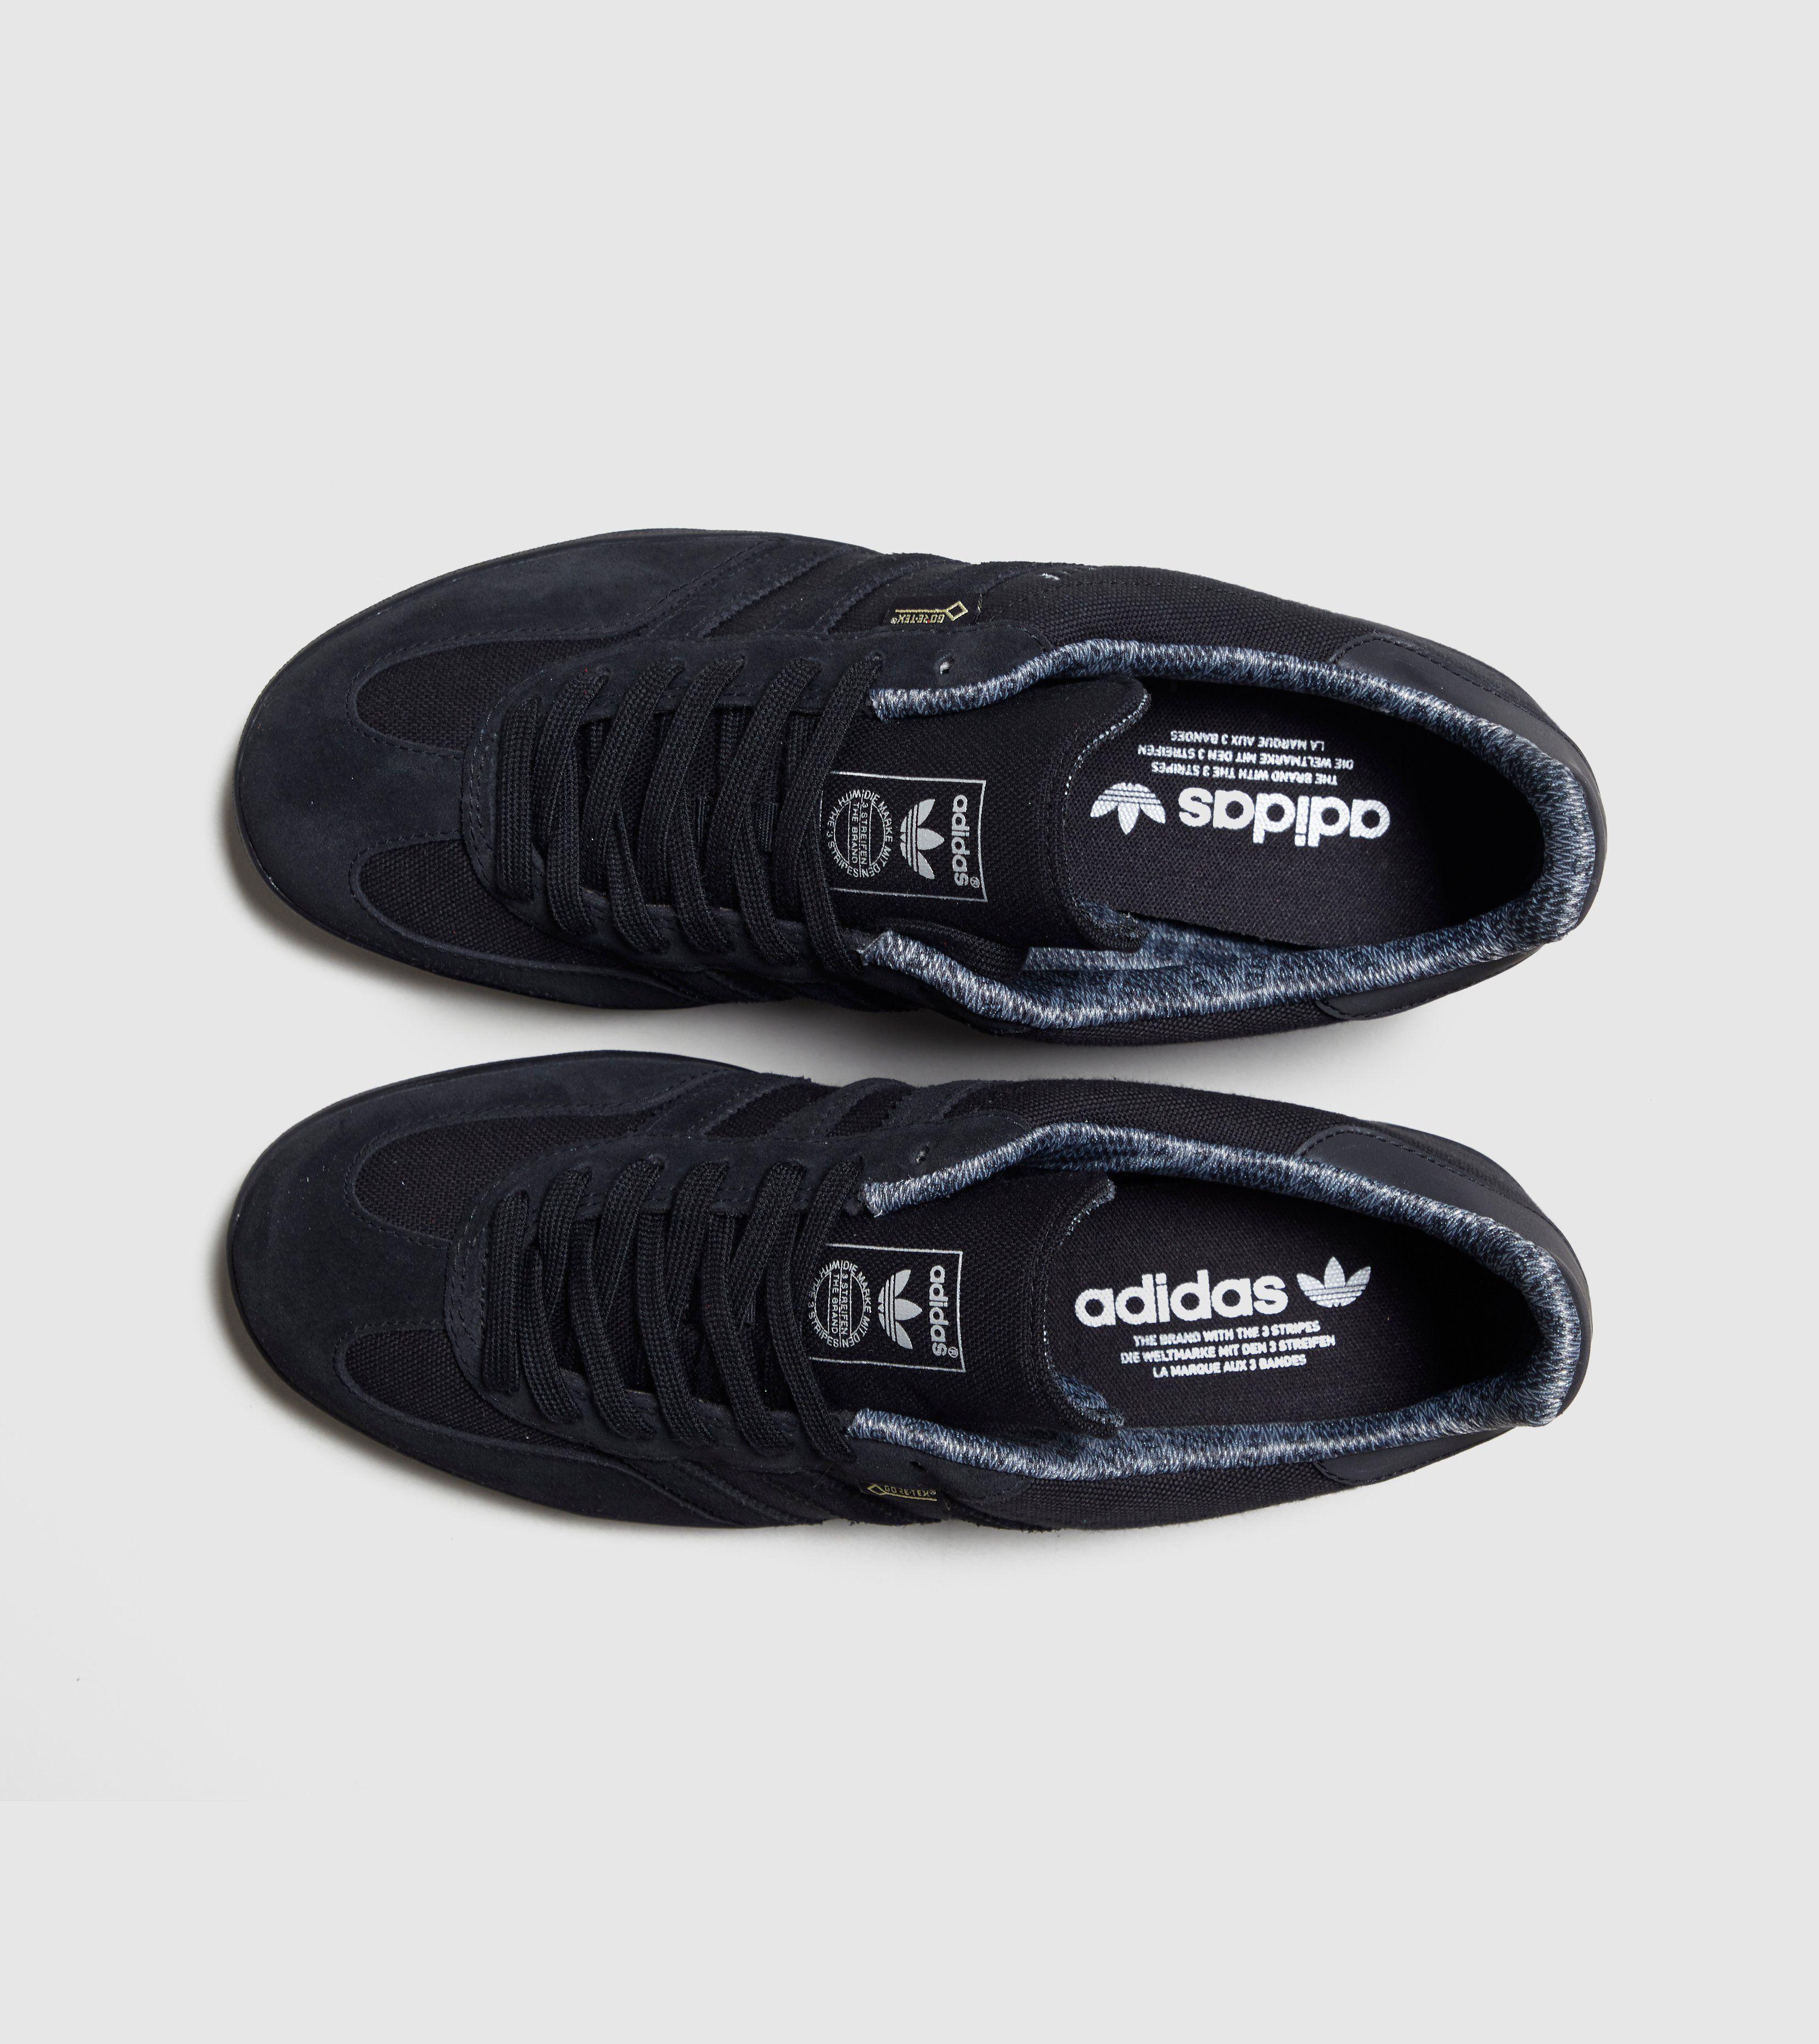 adidas Originals Gazelle Indoor GTX - size? Exclusive